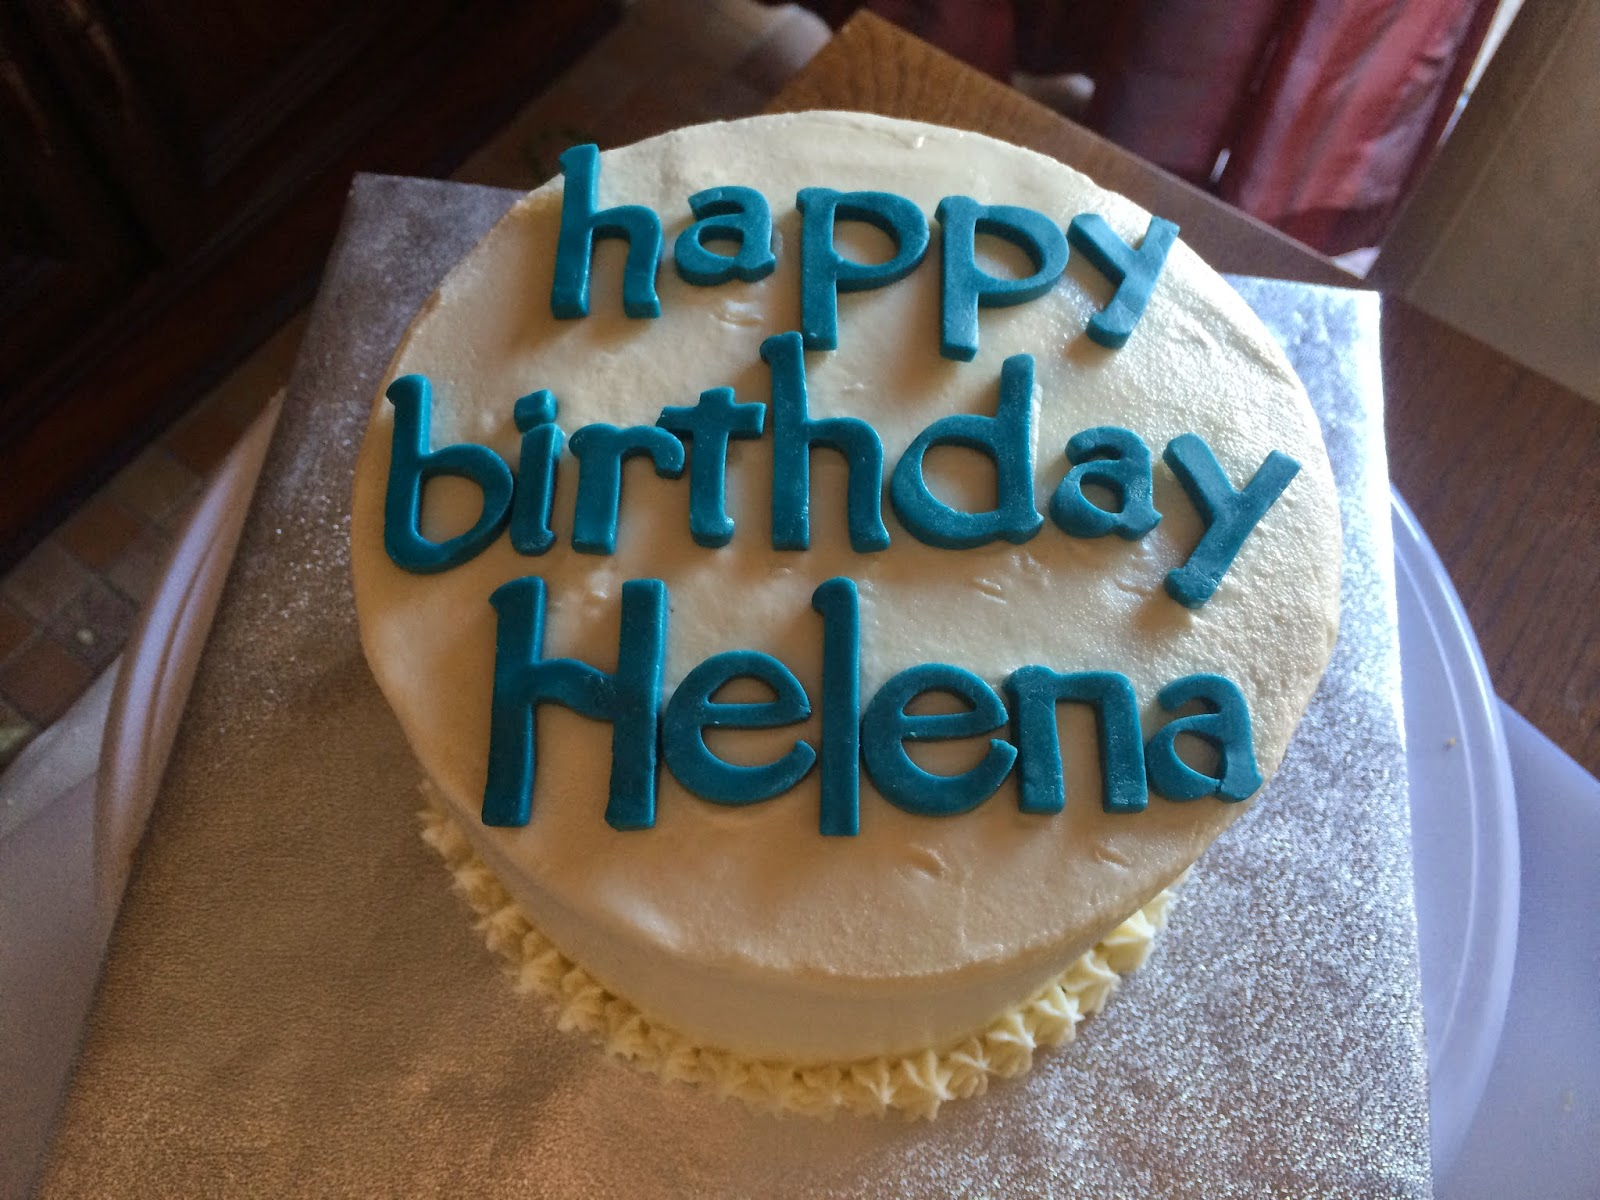 Joyce Gourmet White Teal Happy Birthday Cake